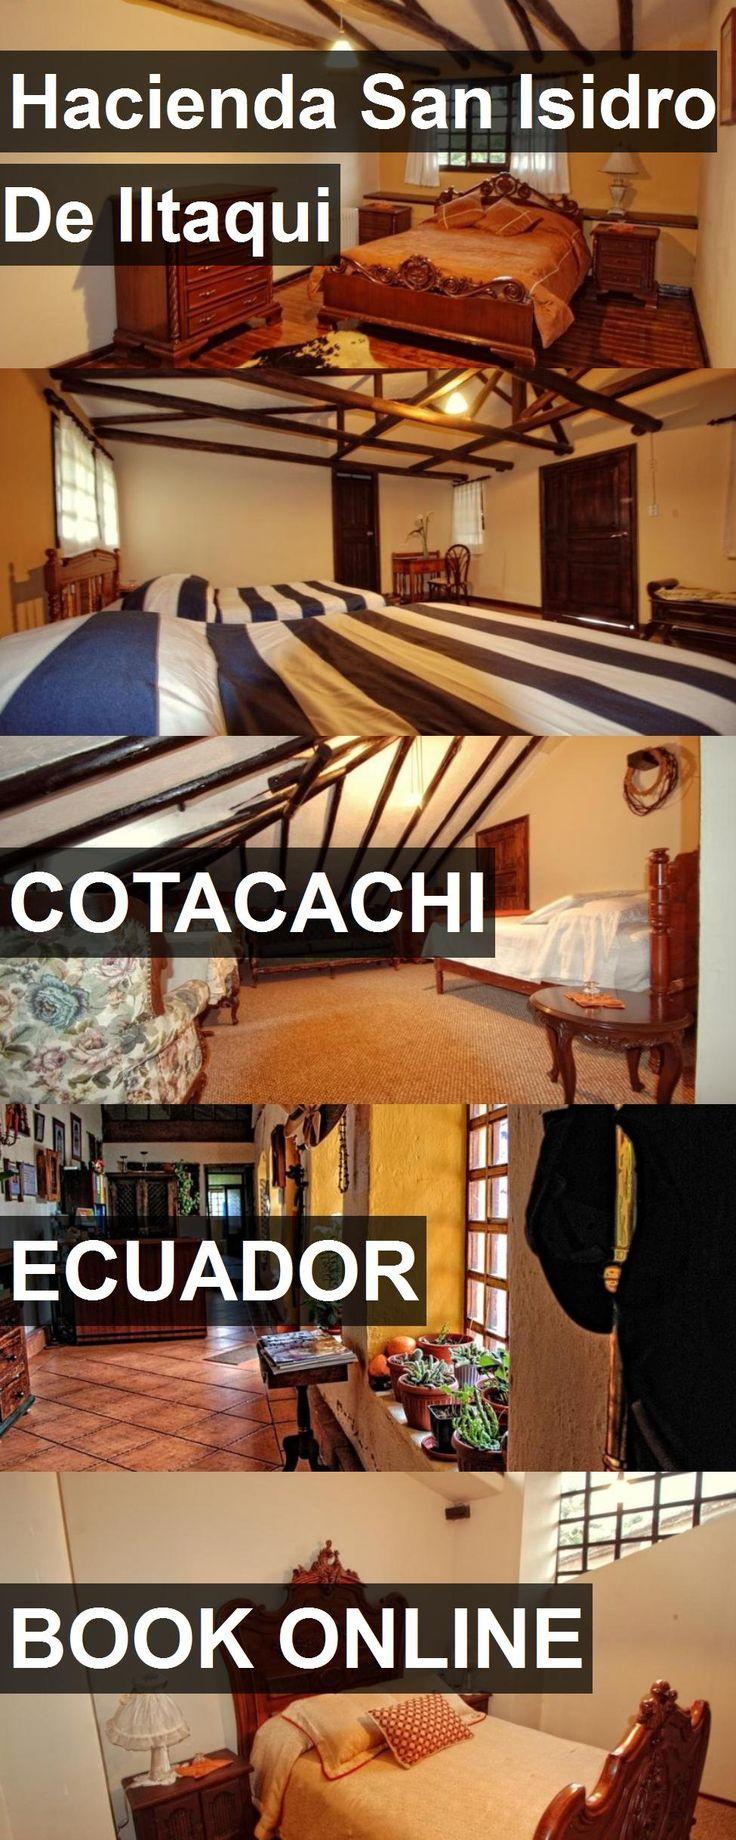 Hotel Hacienda San Isidro De Iltaqui in Cotacachi, Ecuador. For more information, photos, reviews and best prices please follow the link. #Ecuador #Cotacachi #travel #vacation #hotel